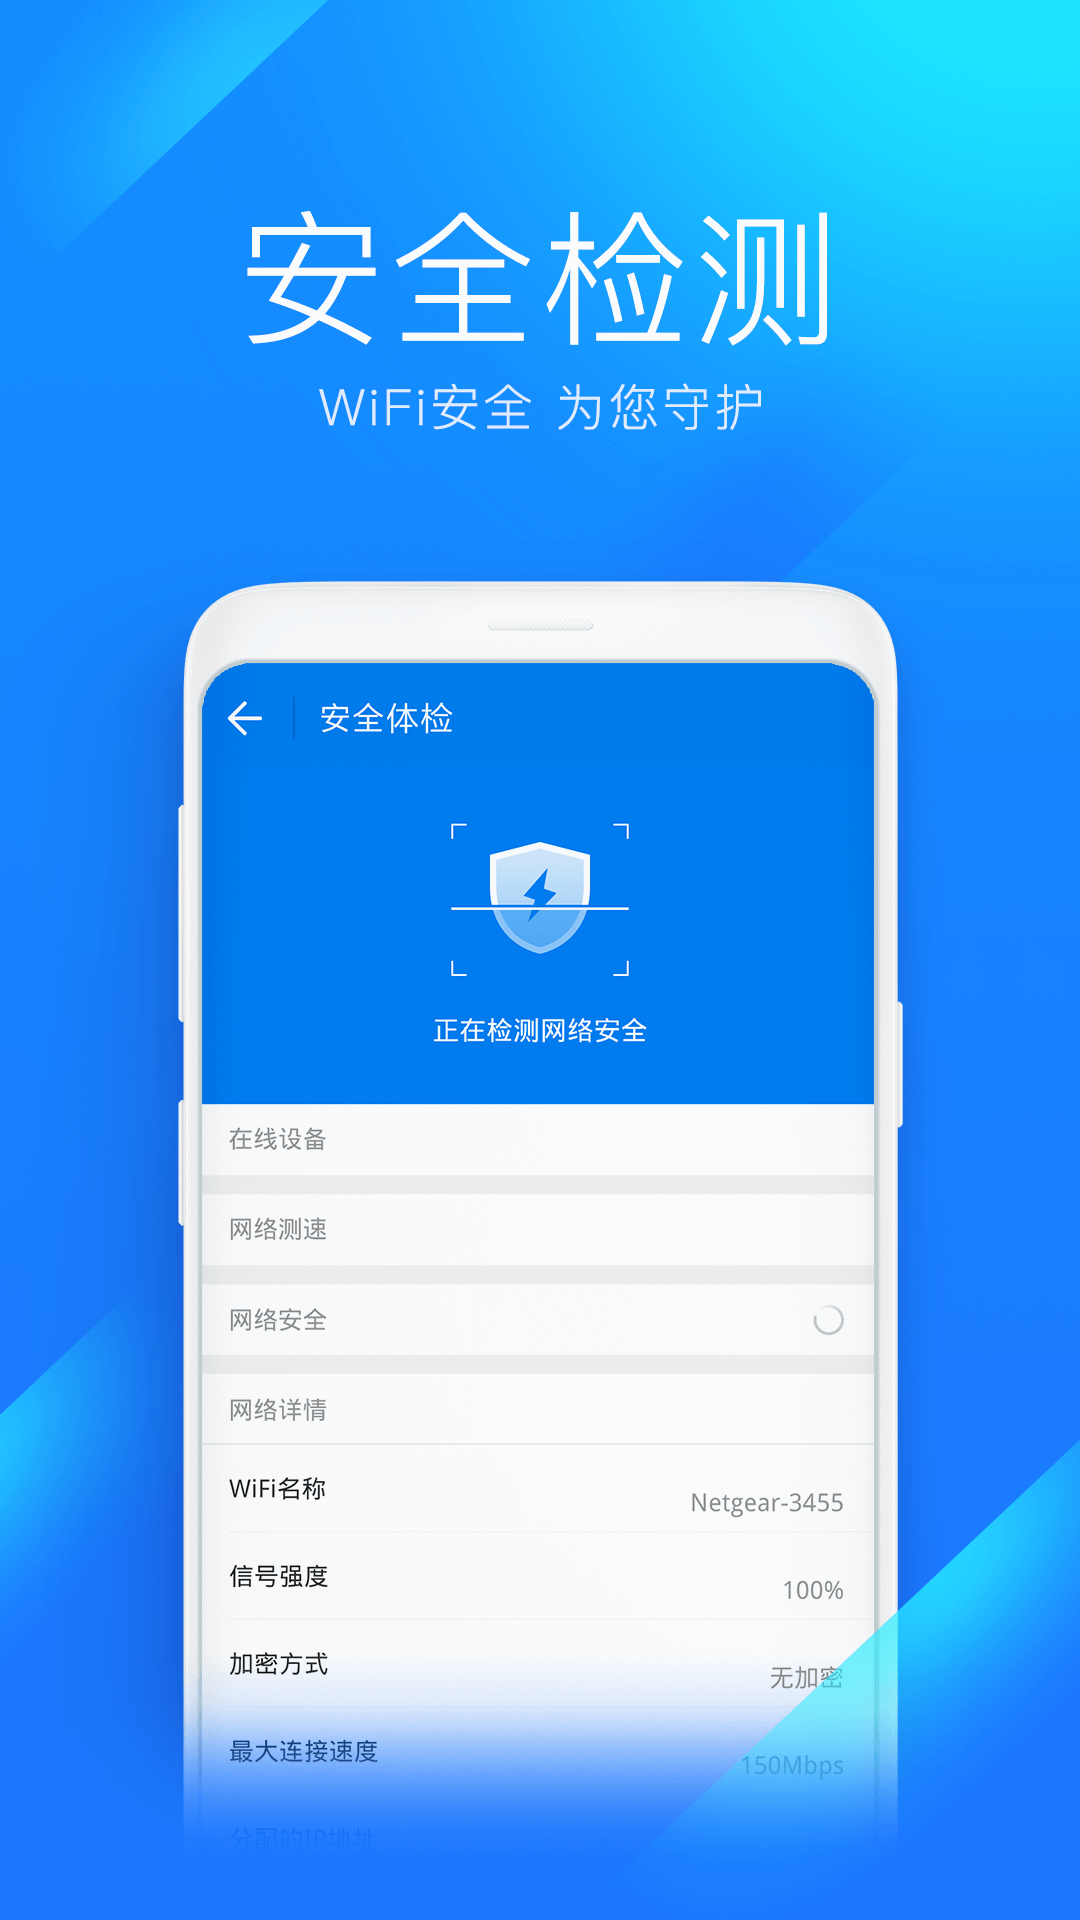 WiFi万能钥匙安卓免费版 V4.6.88